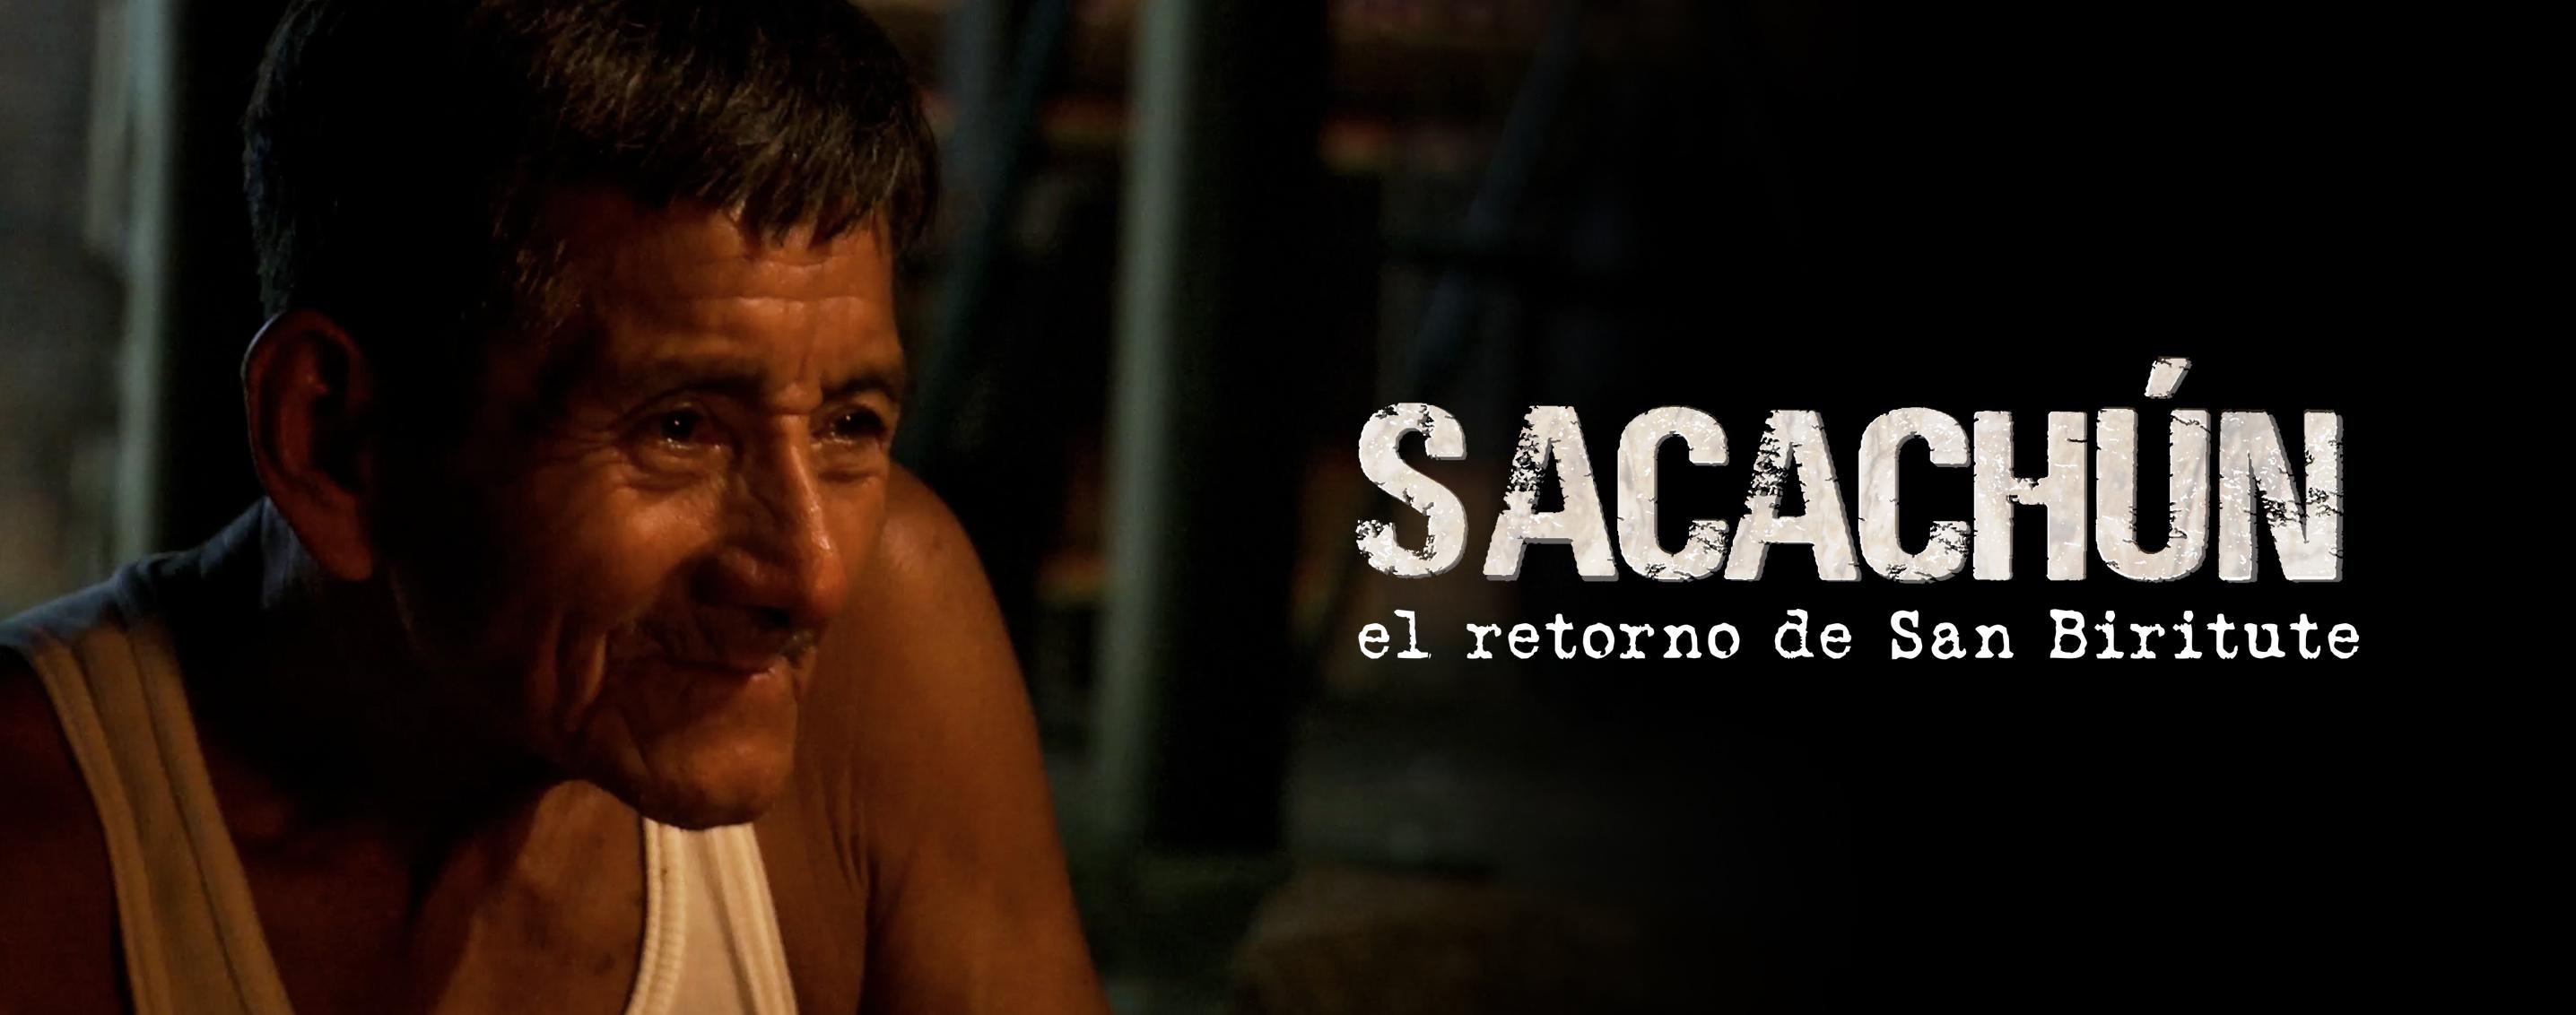 Sacachún, cine independiente ecuador